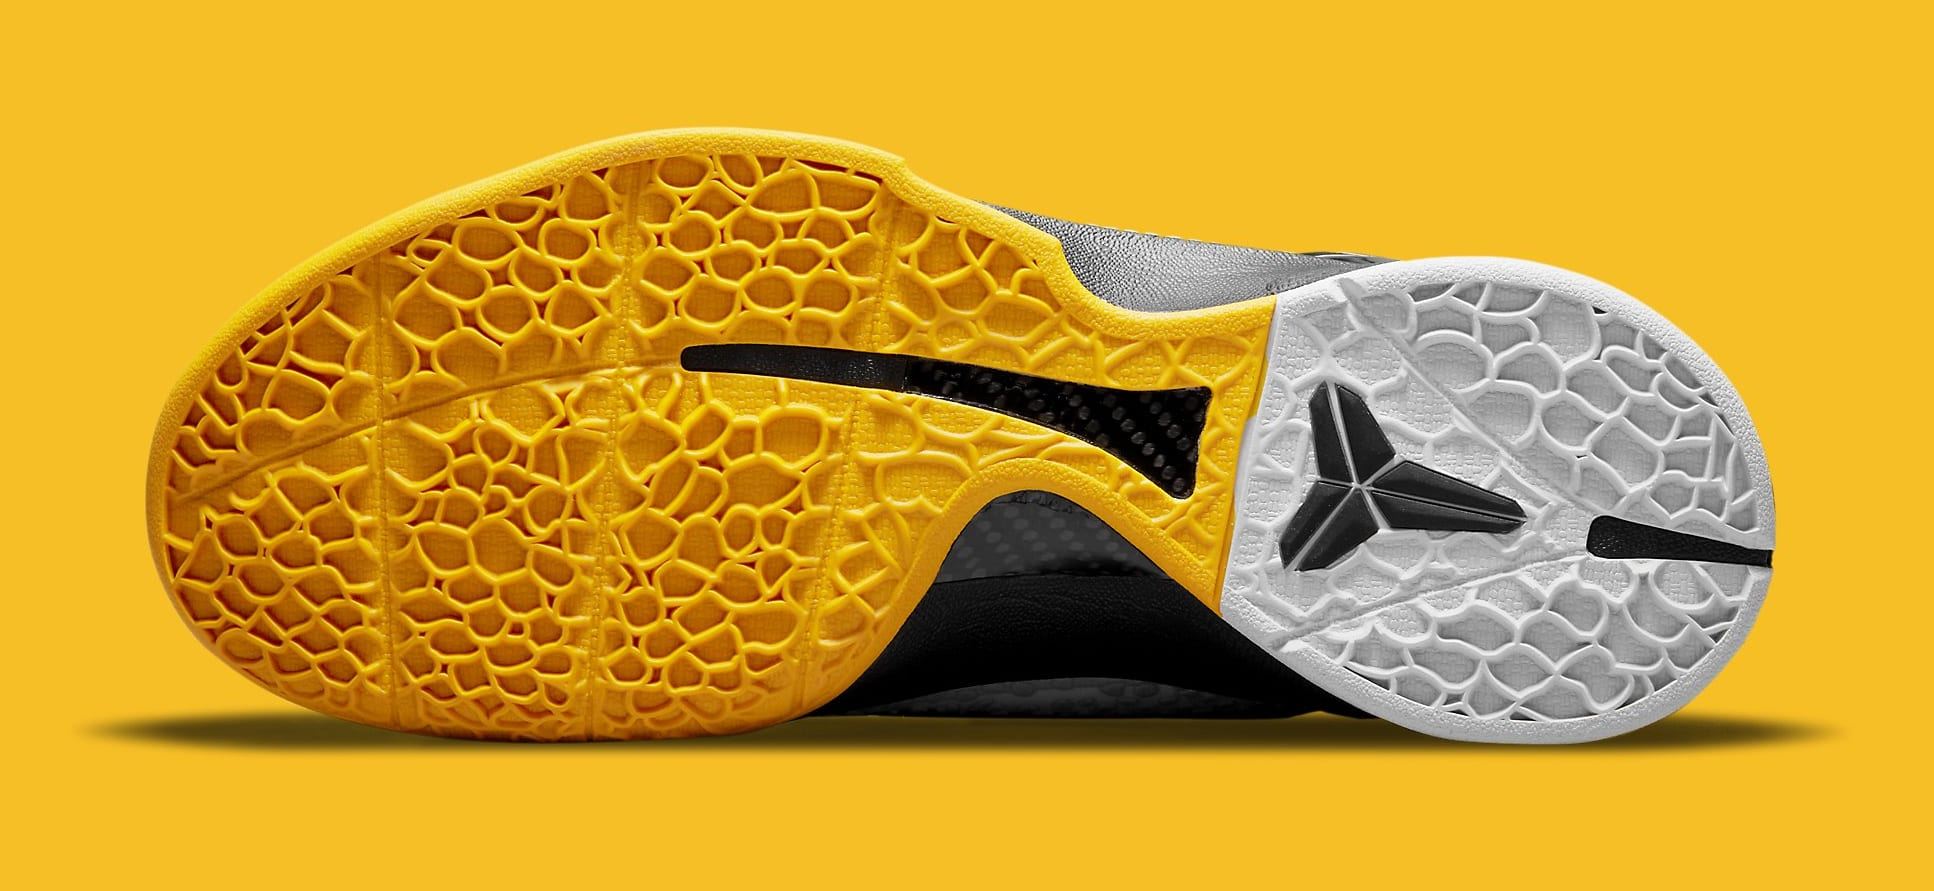 Nike Kobe 6 Protro 'POP' CW2190-100 Outsole